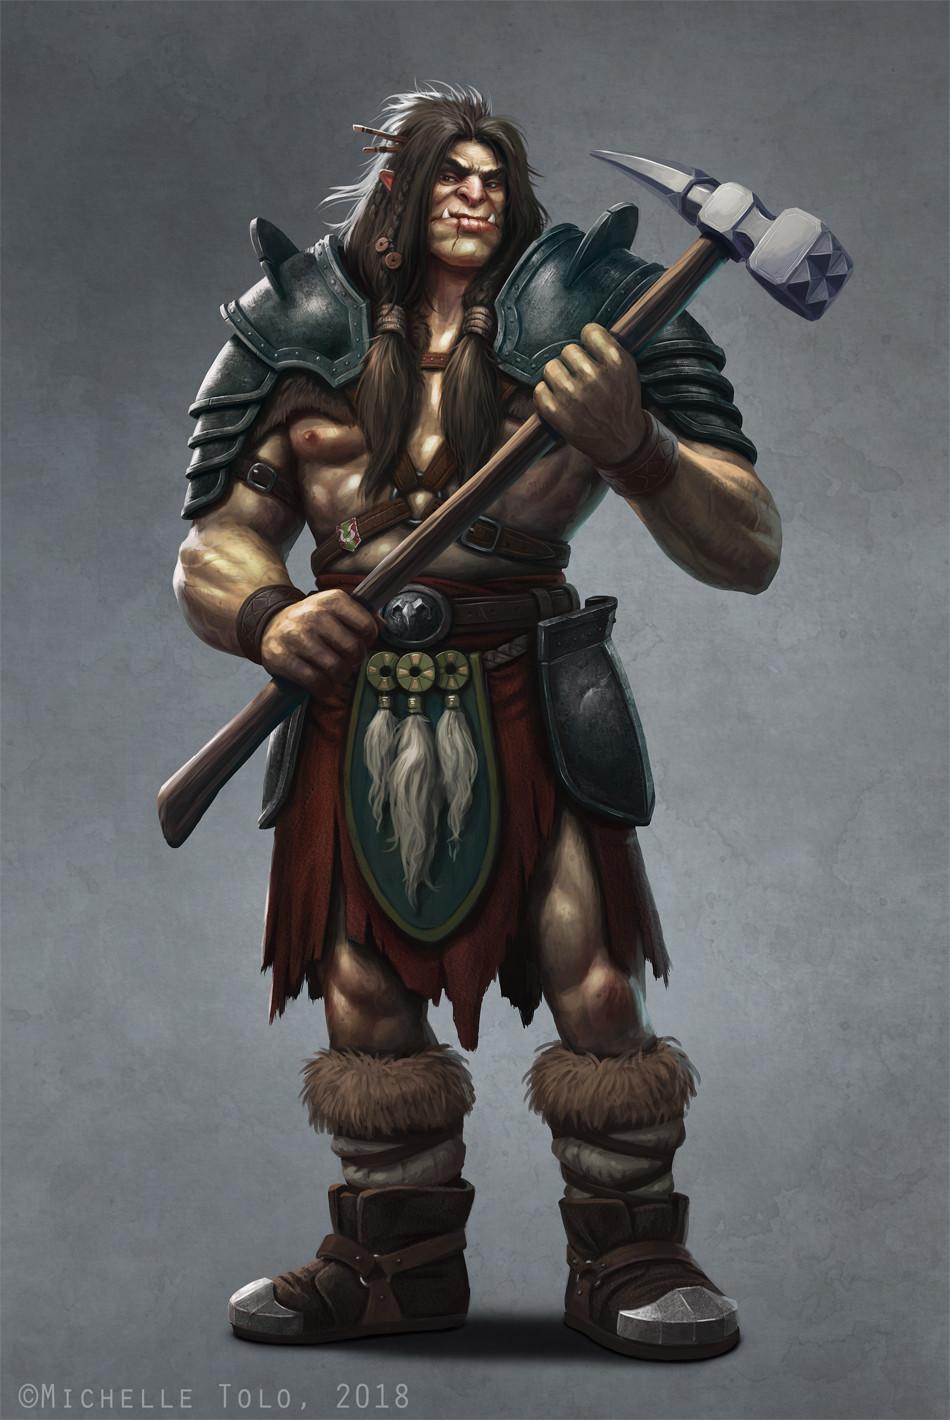 Brahn, the companion and guard.